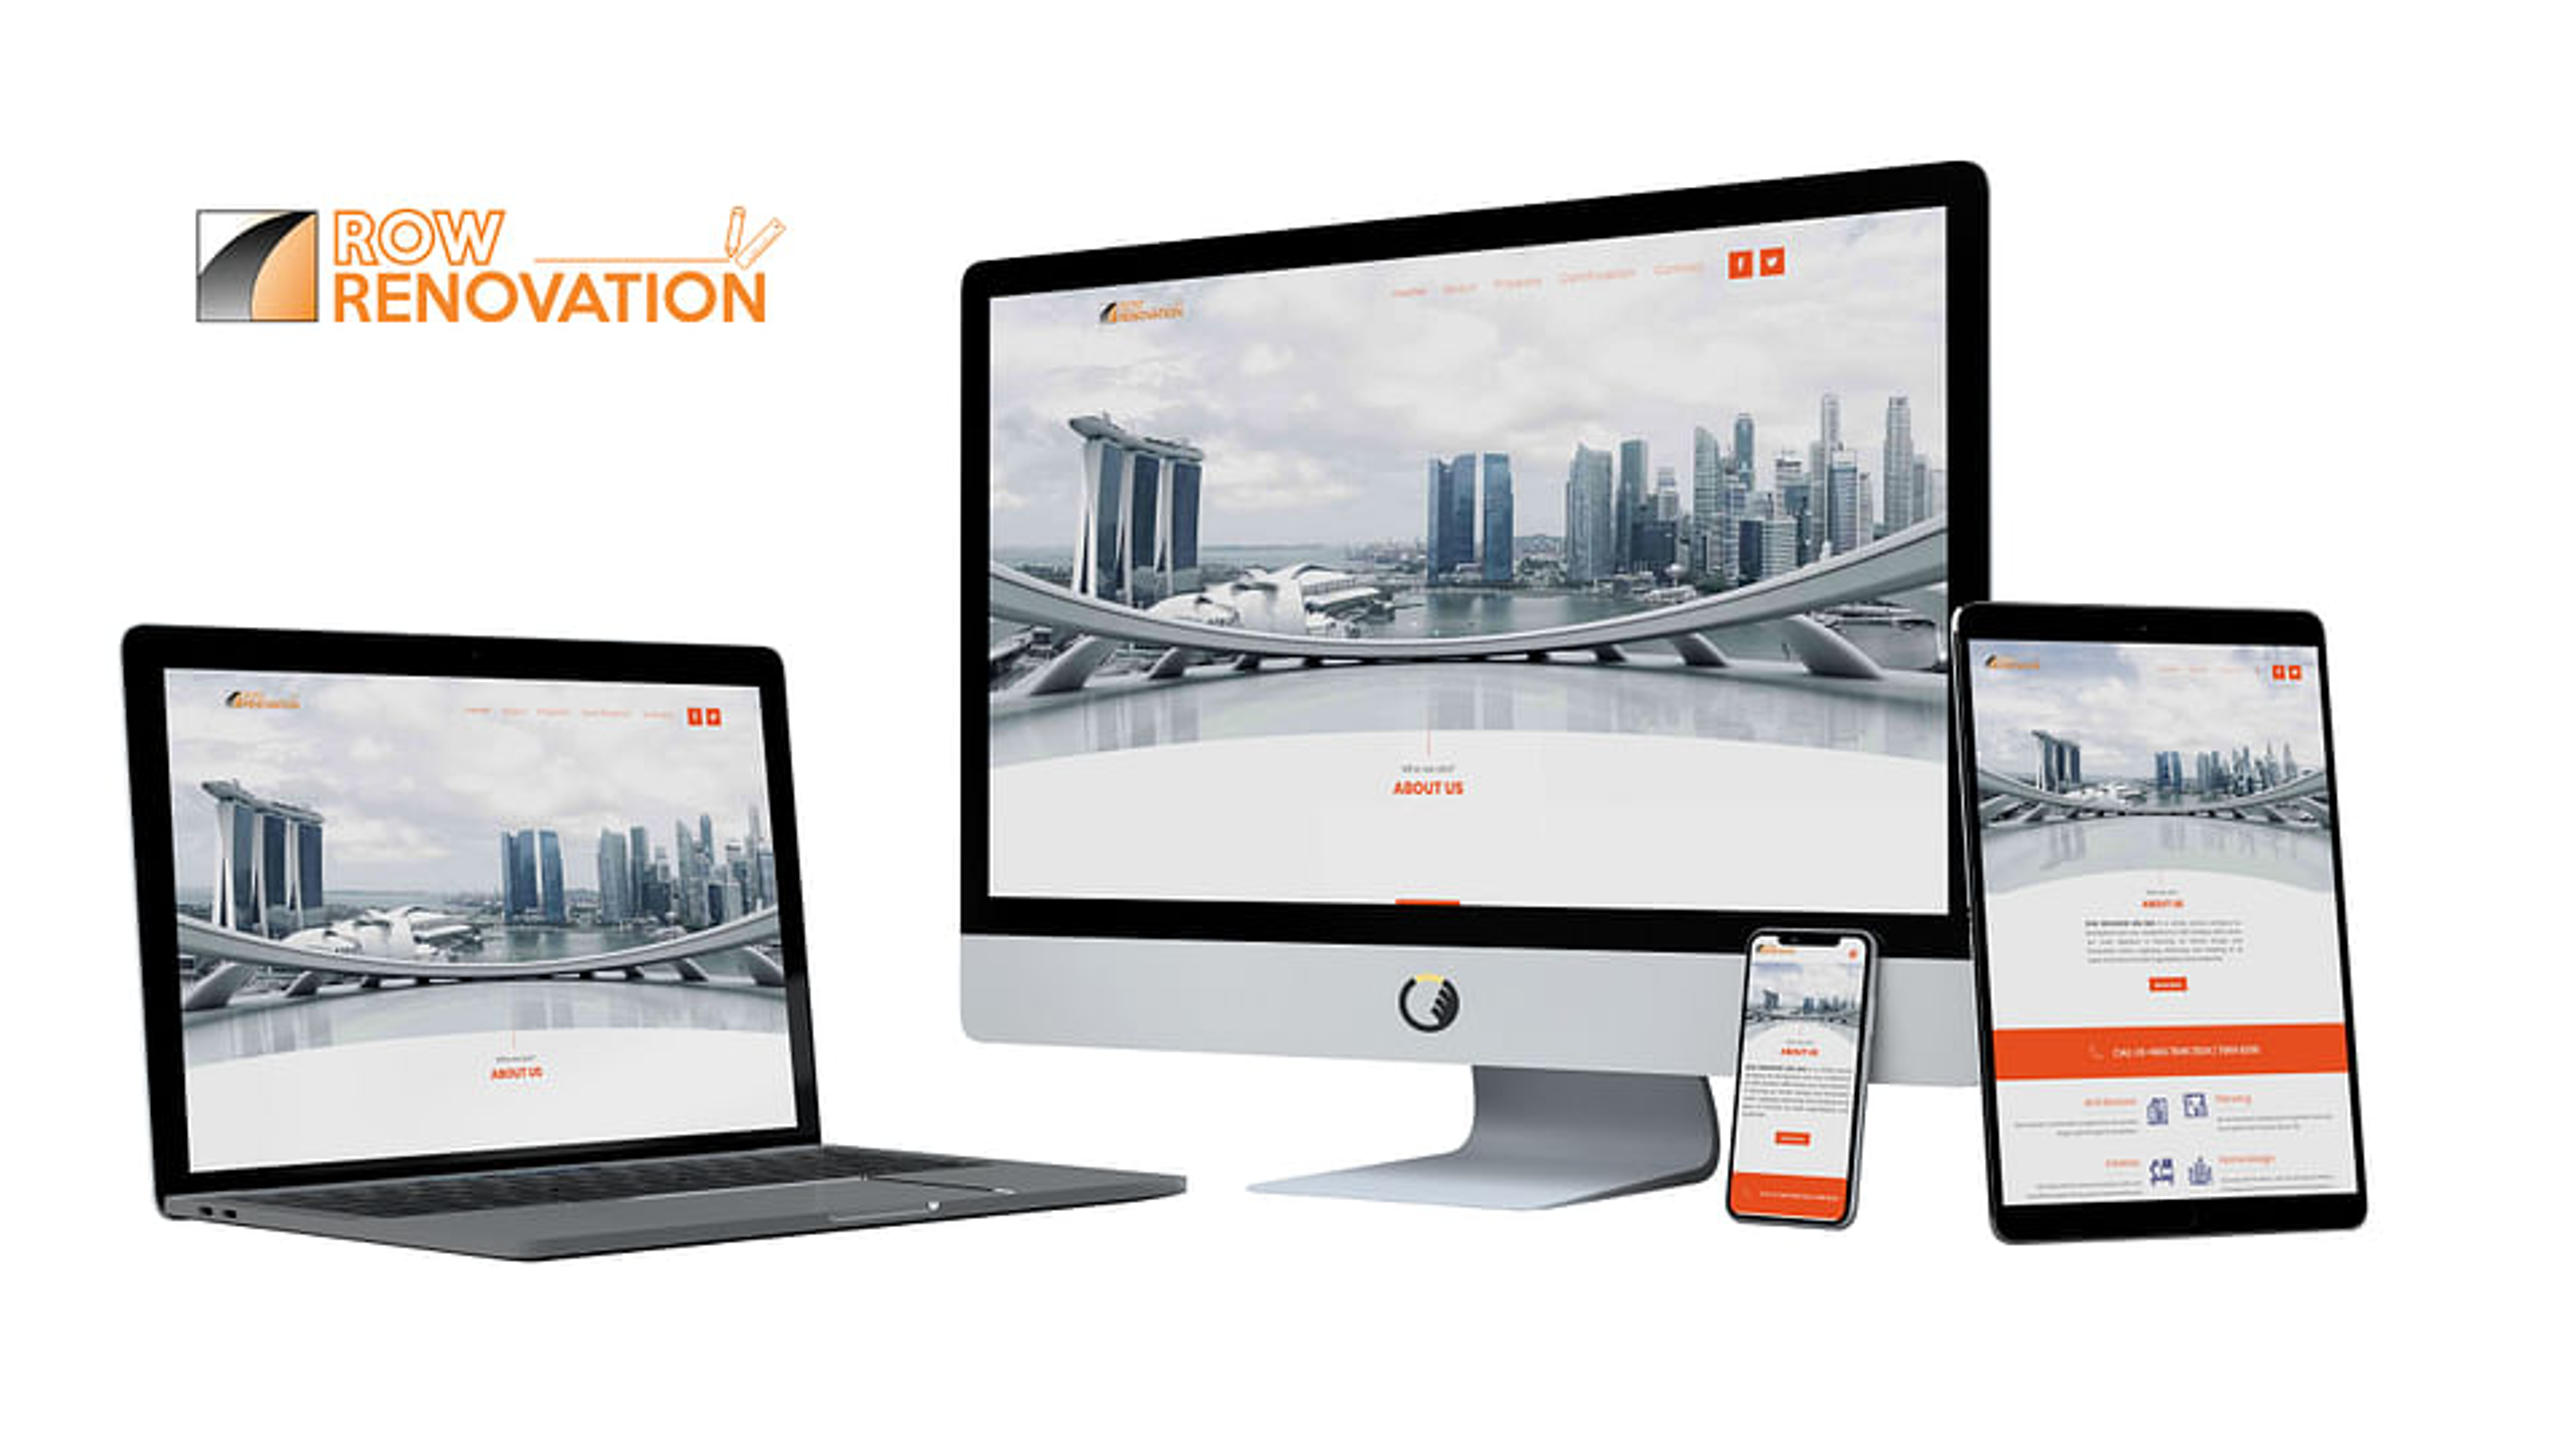 Row Renovation Website